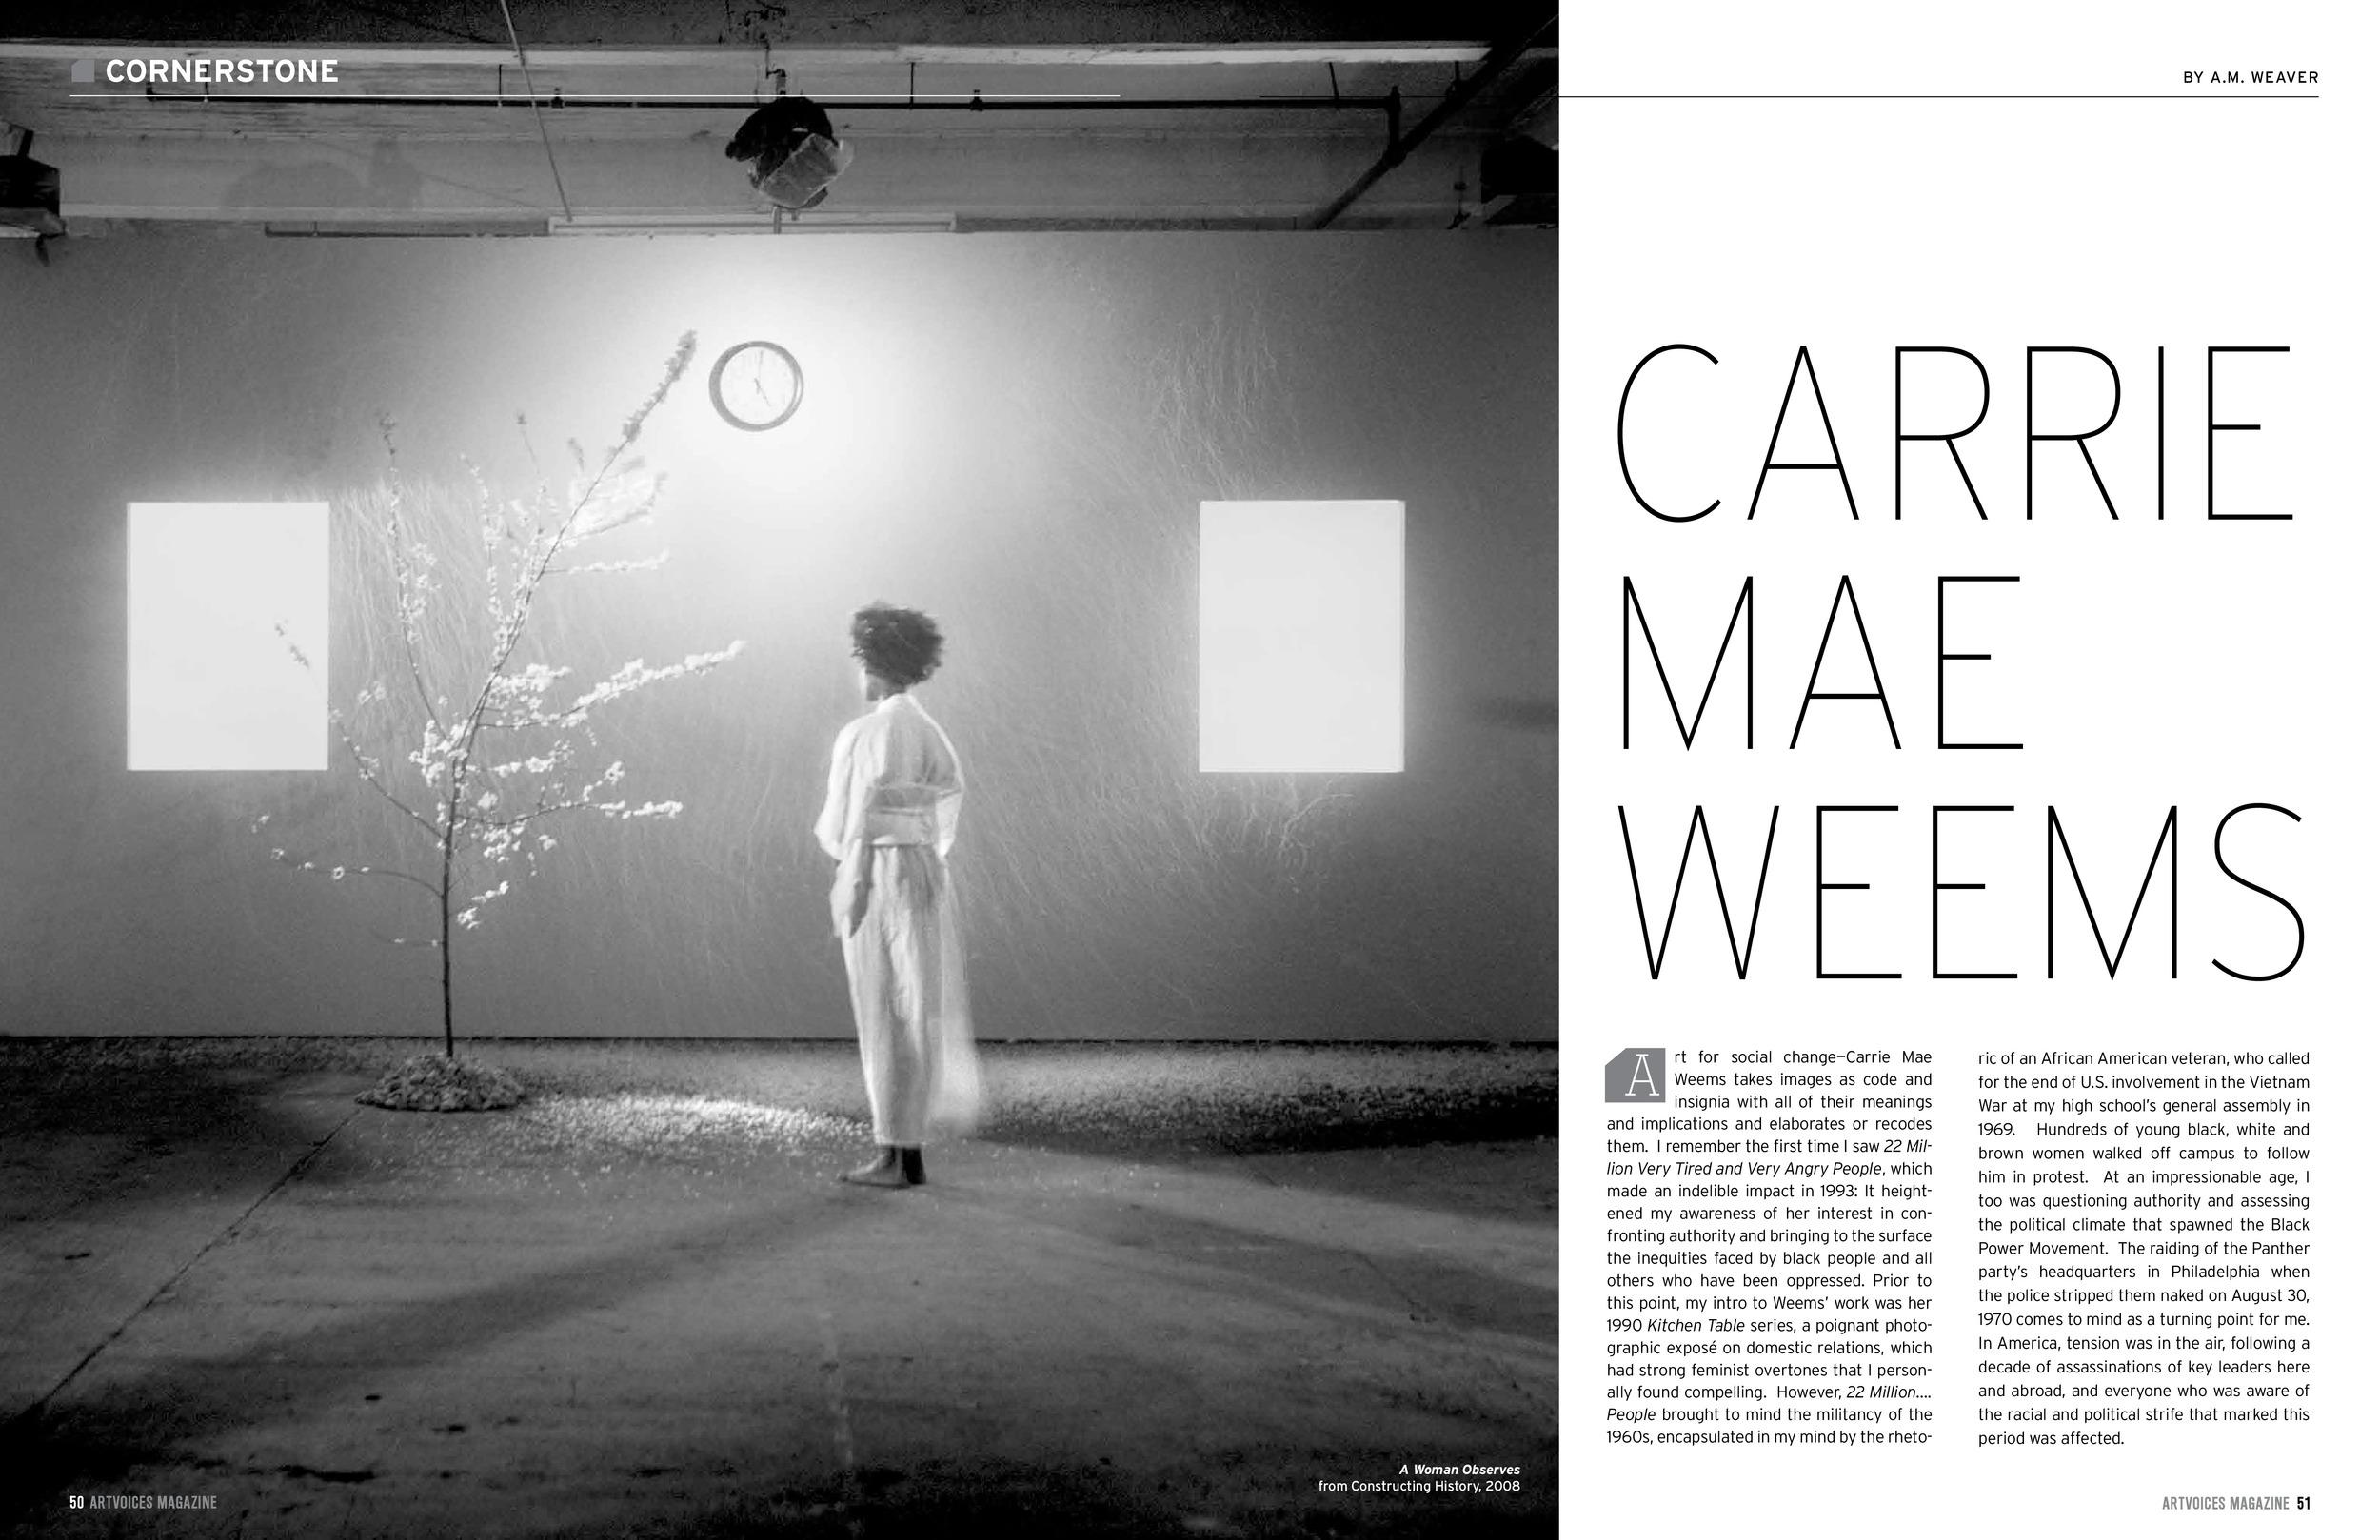 CarrieAnnWeems-page-0.jpg